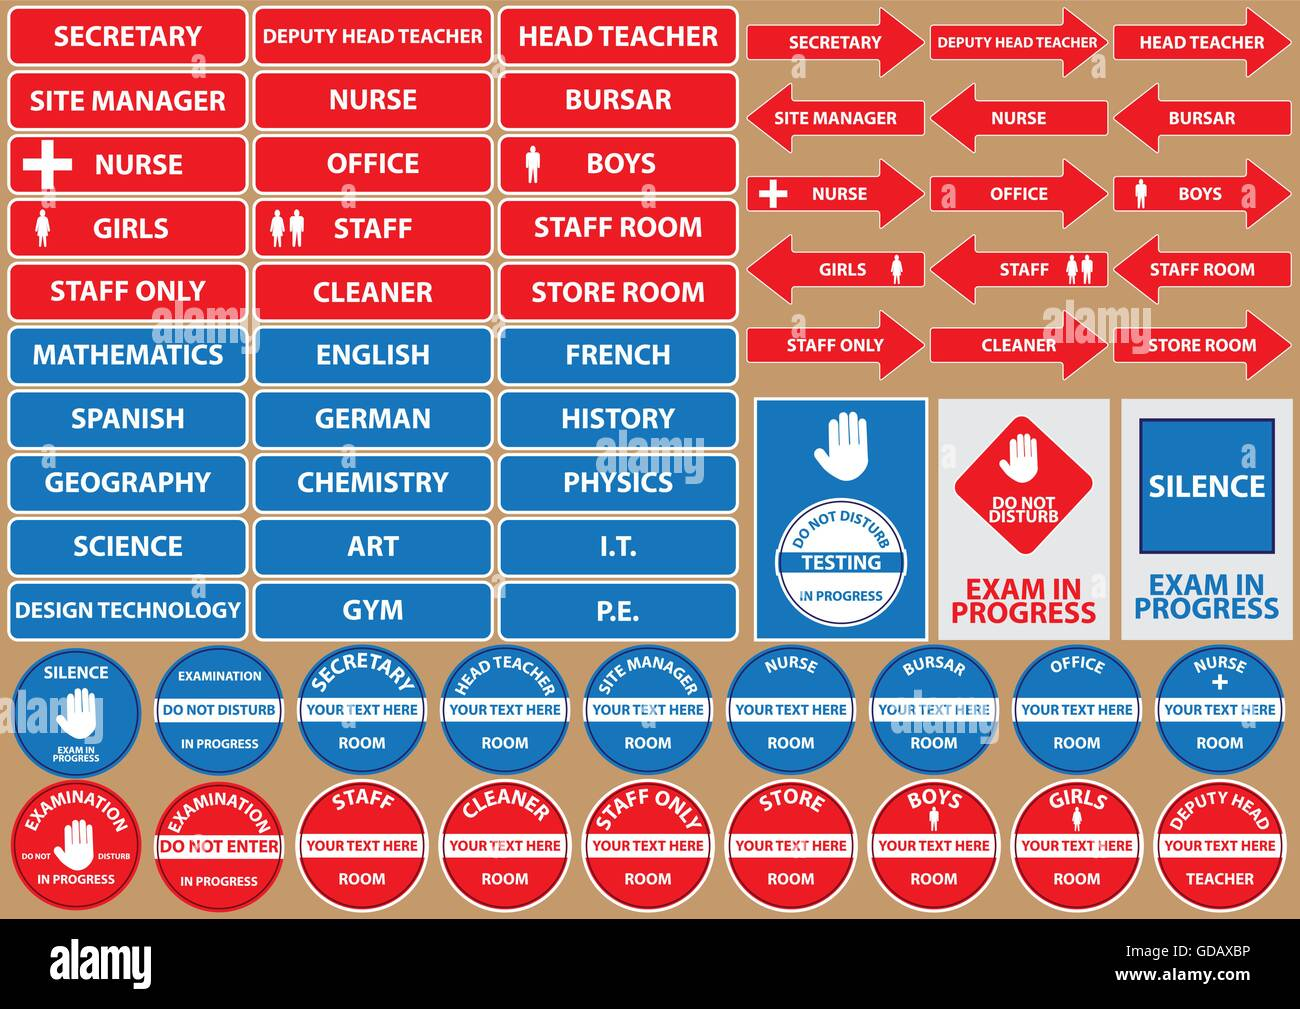 set of school environment signs/symbols (exam, staff, head teacher, secretary, nurse, room). flat vector illustration - Stock Image